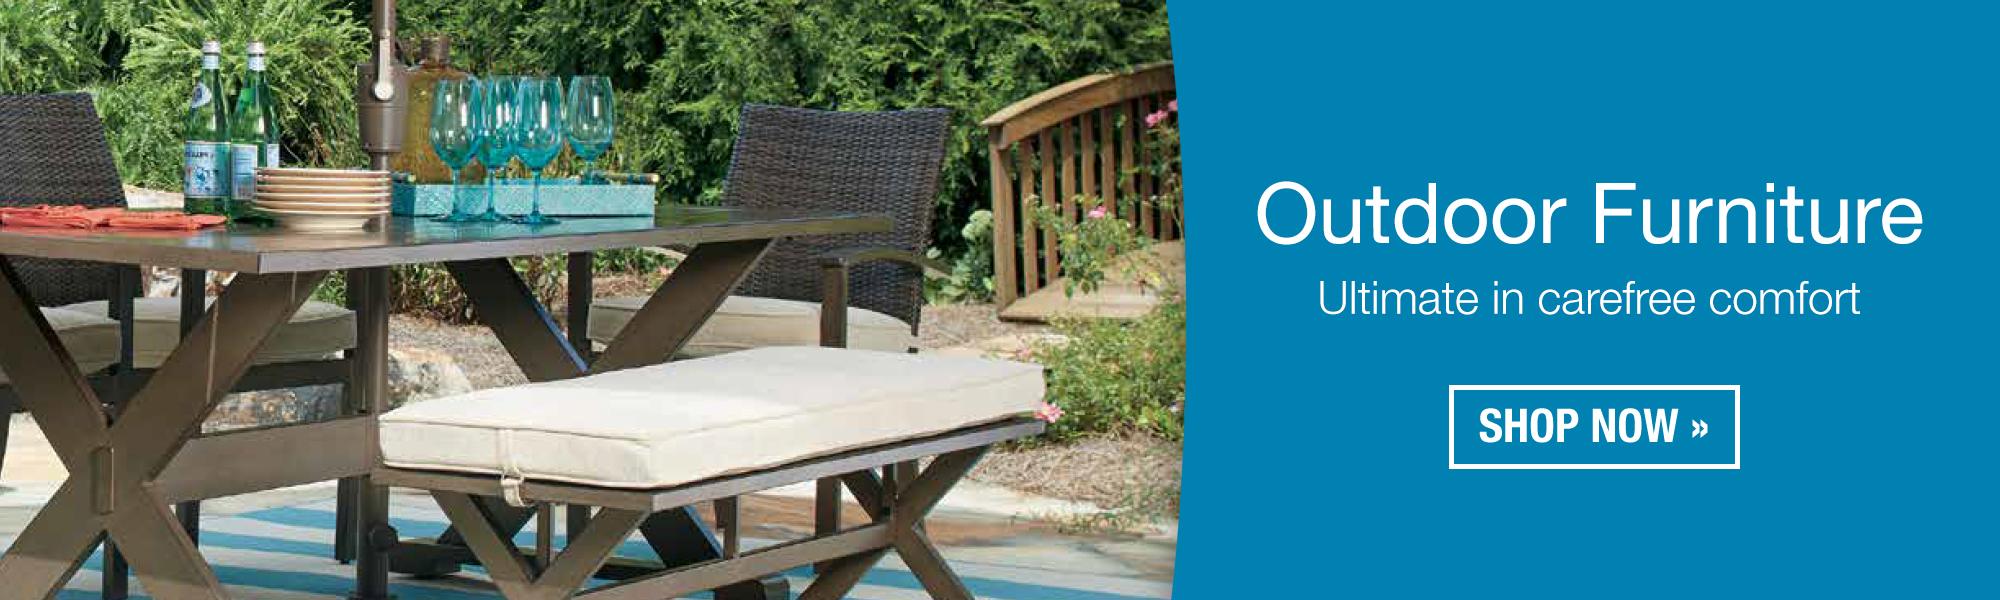 Parra Furniture & Appliance - Appliances, Electronics, Furniture ...